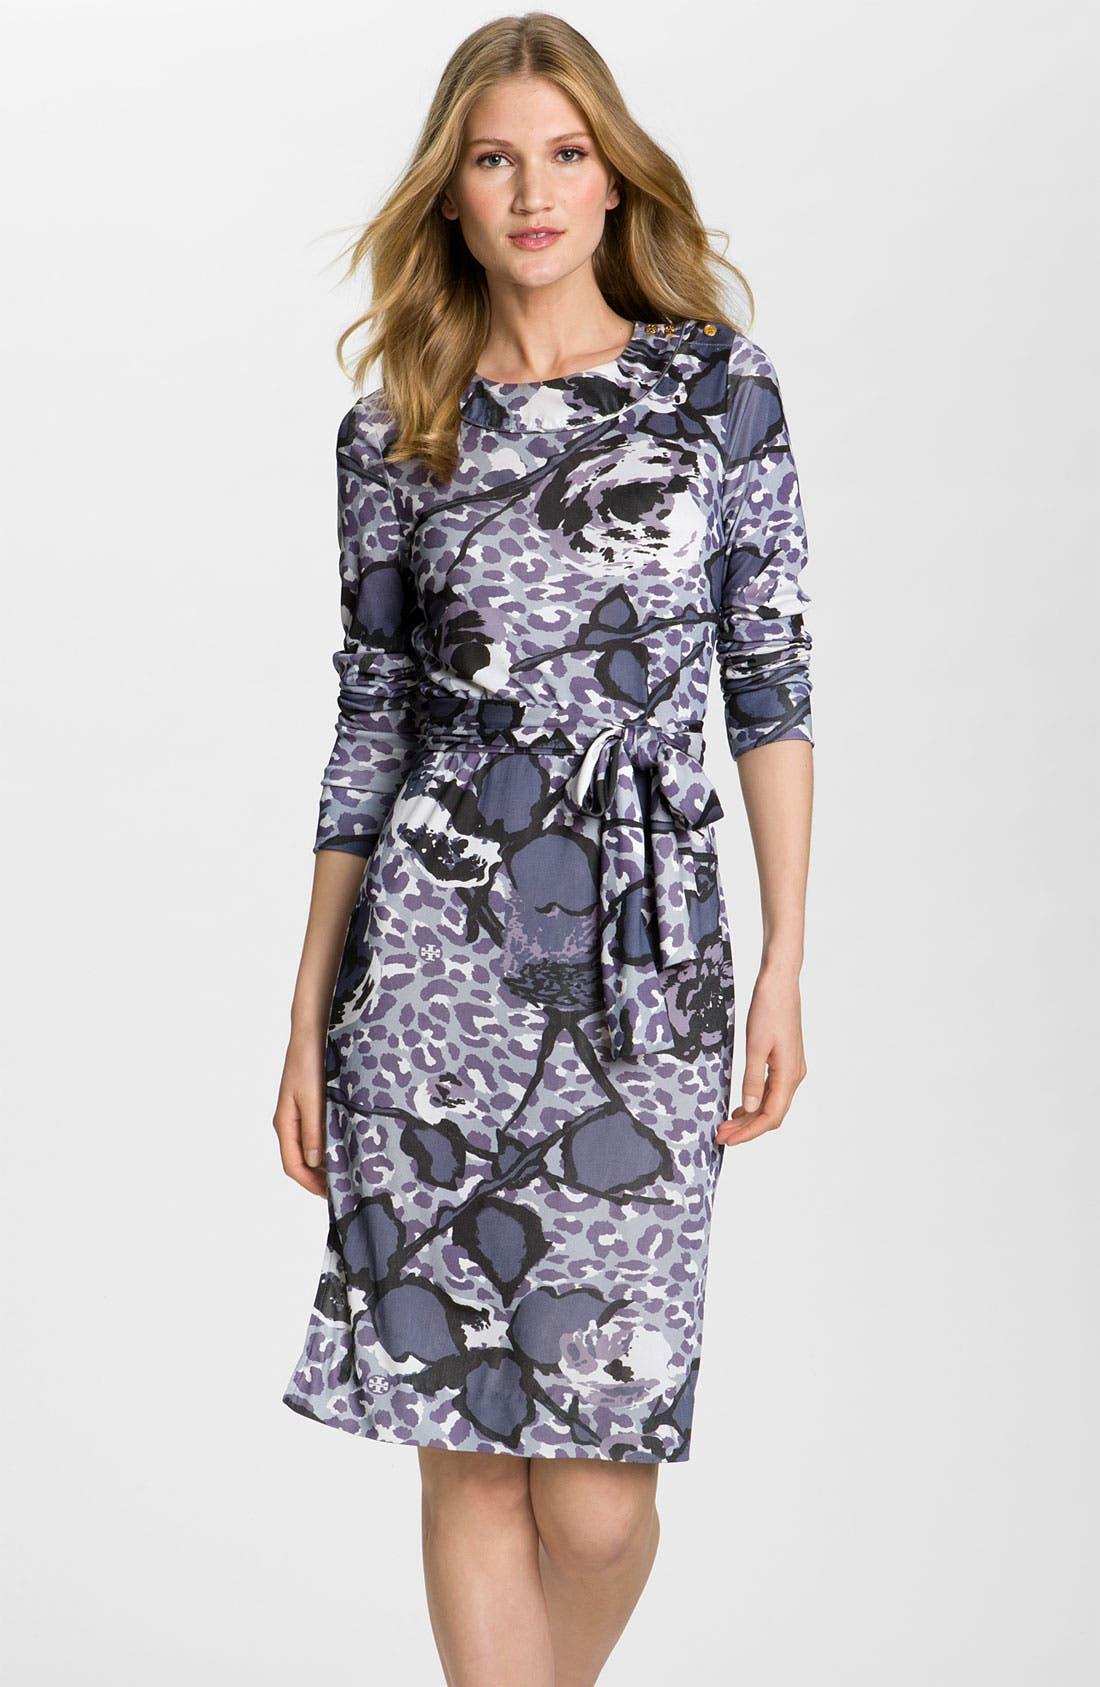 Alternate Image 1 Selected - Tory Burch 'Cory' Silk Dress